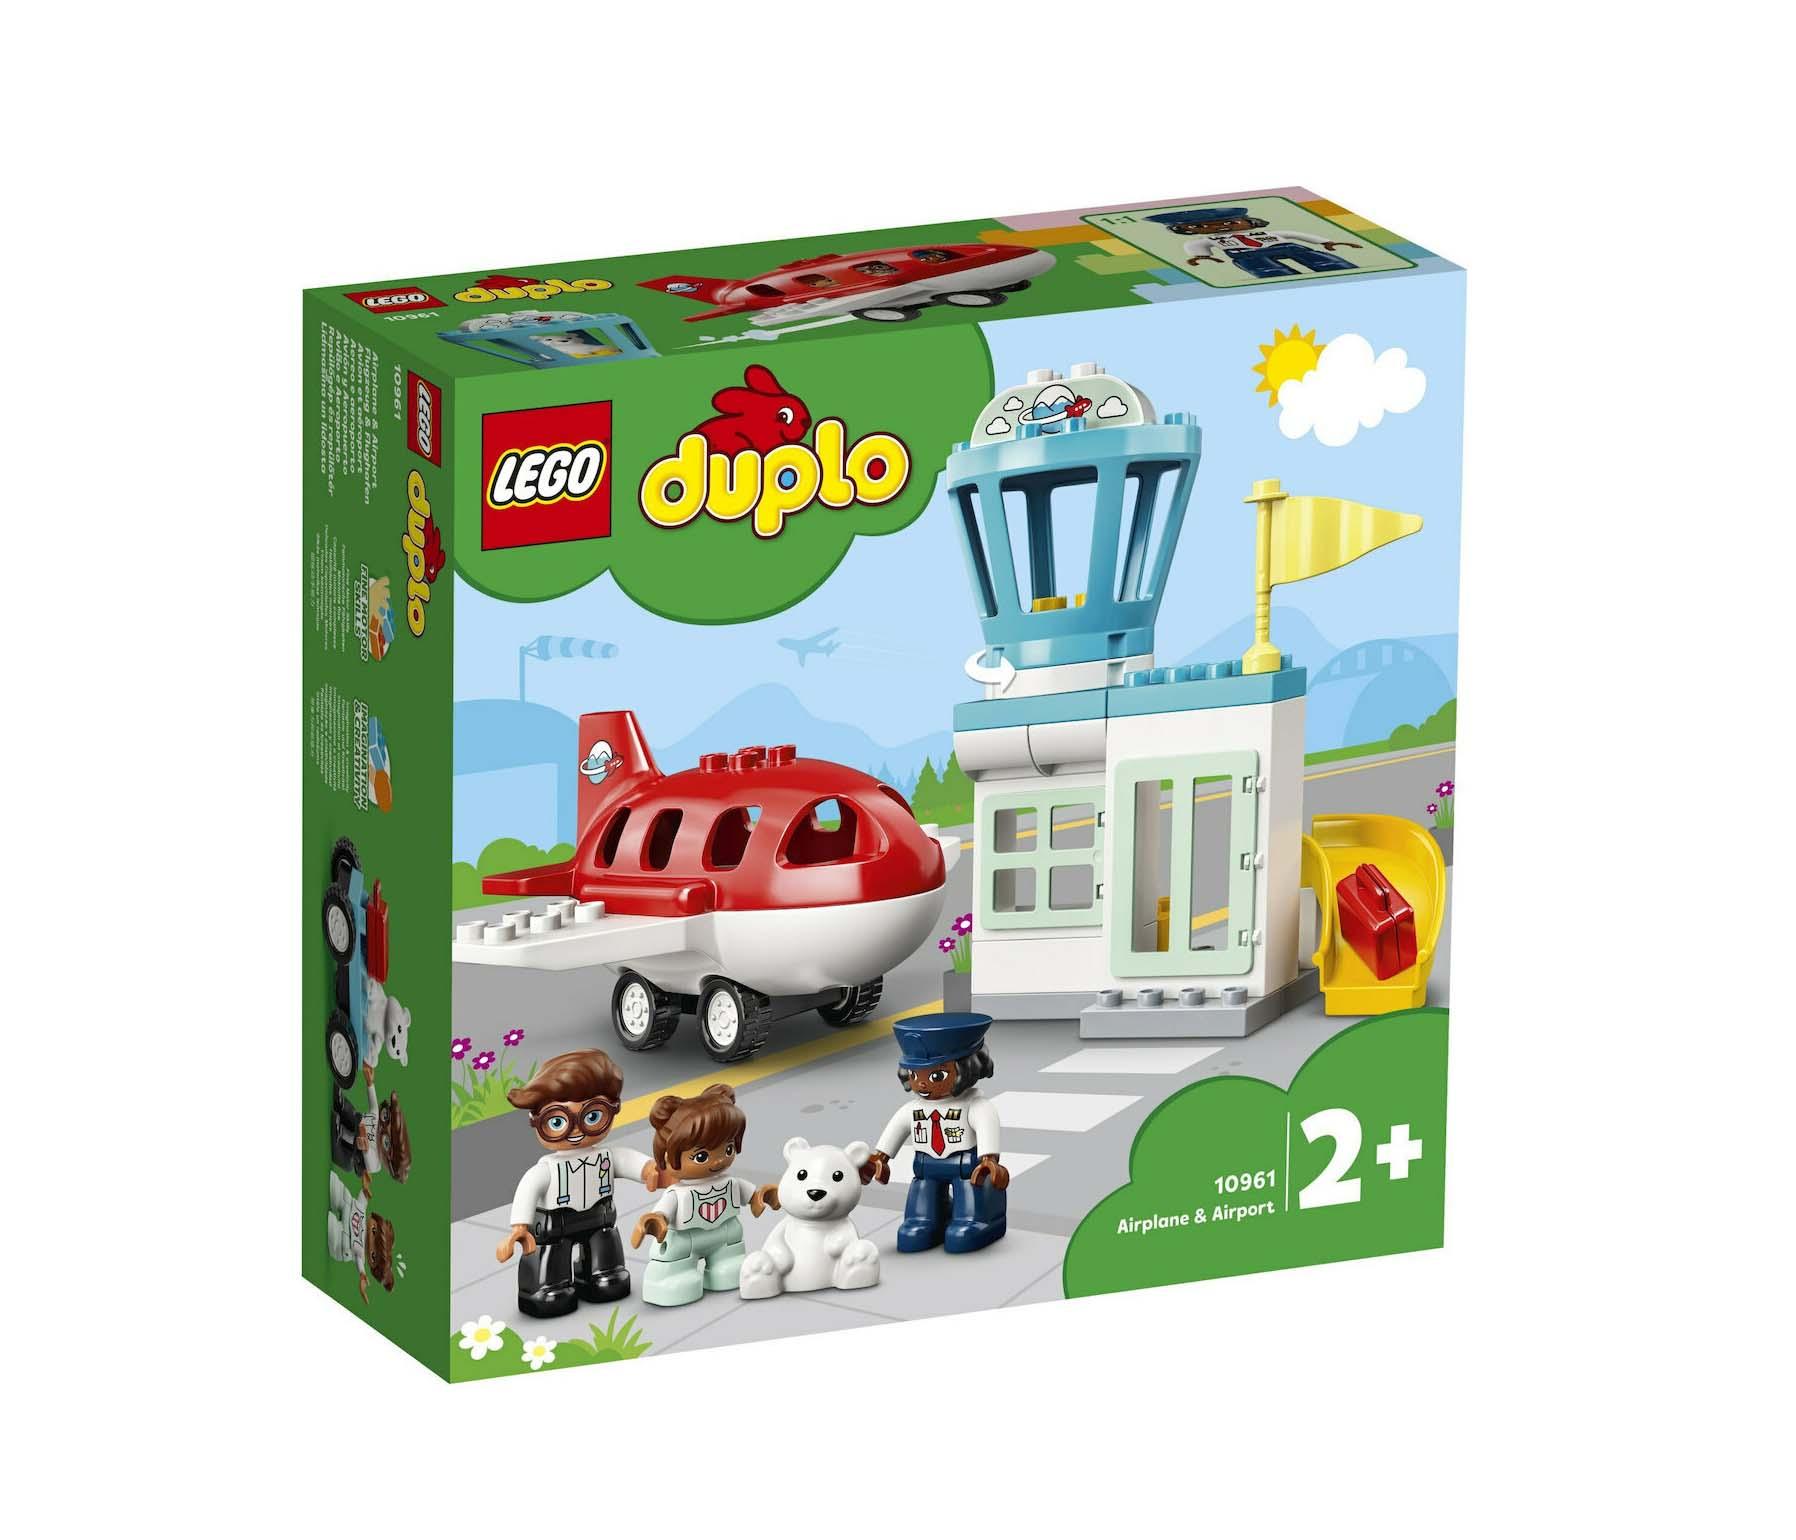 Lego Duplo: Airplane & Airport 10961